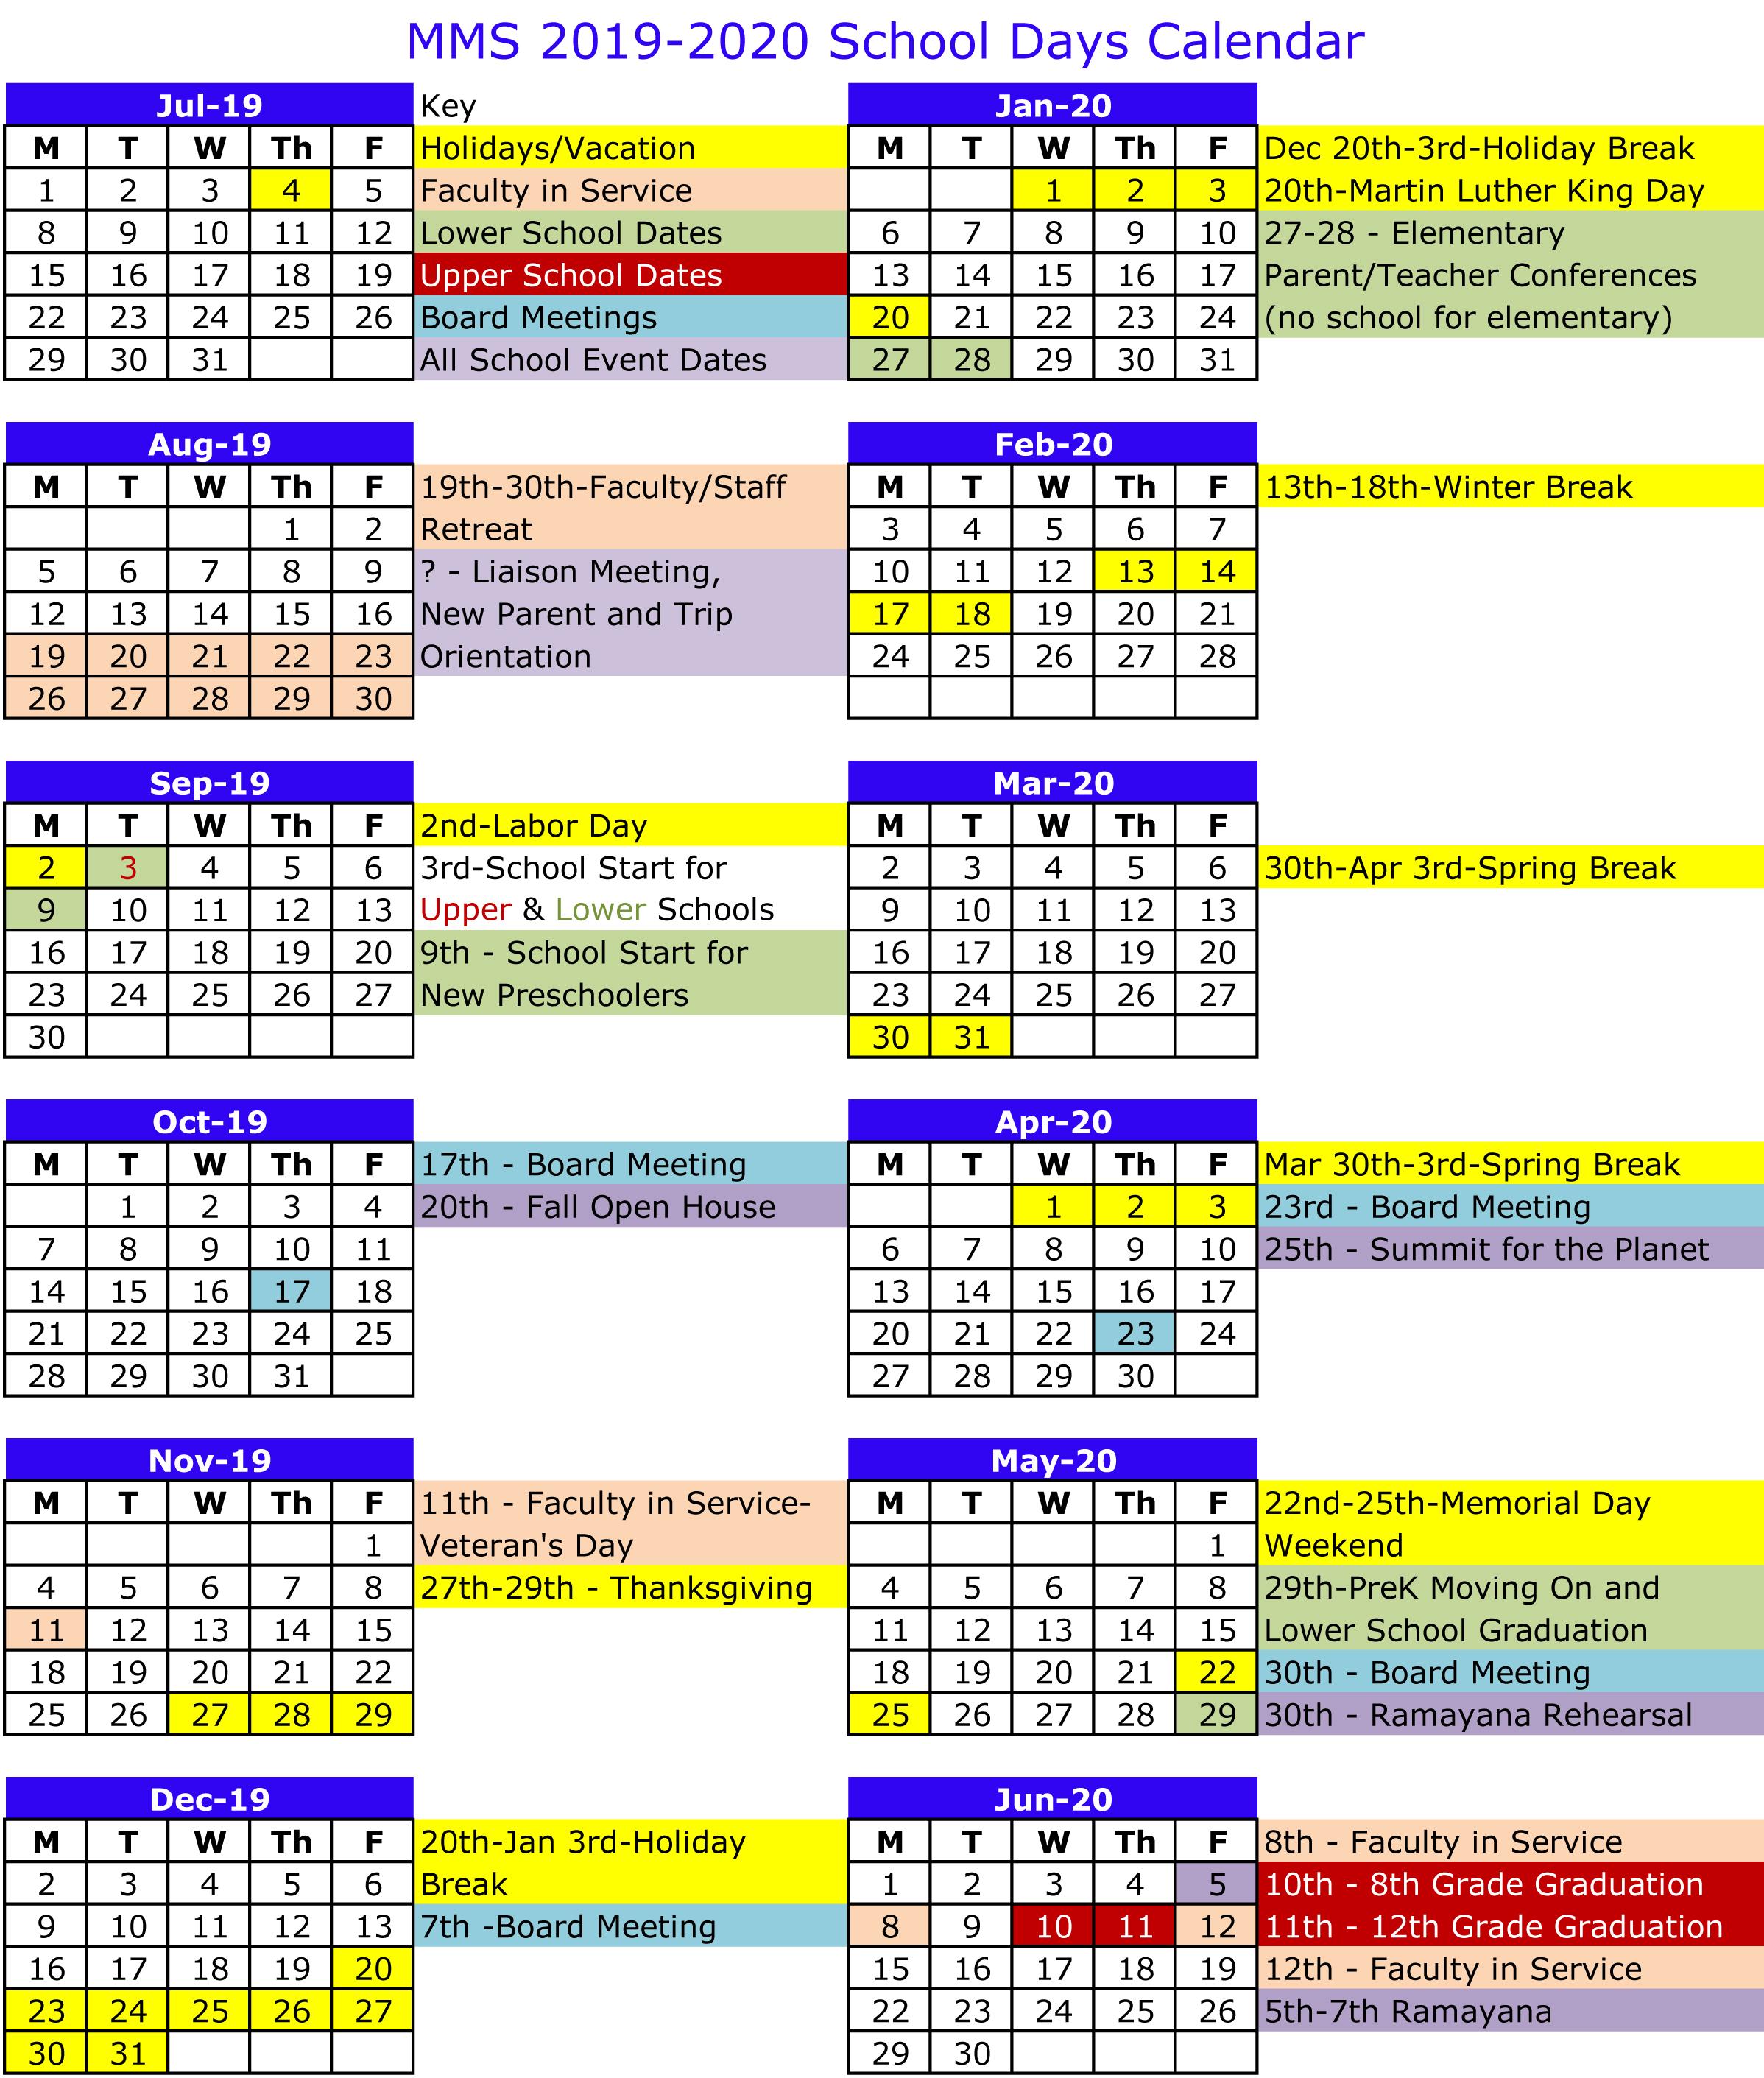 Calendario Madonna 2020.2019 2020 School Days Calendar Mount Madonna School